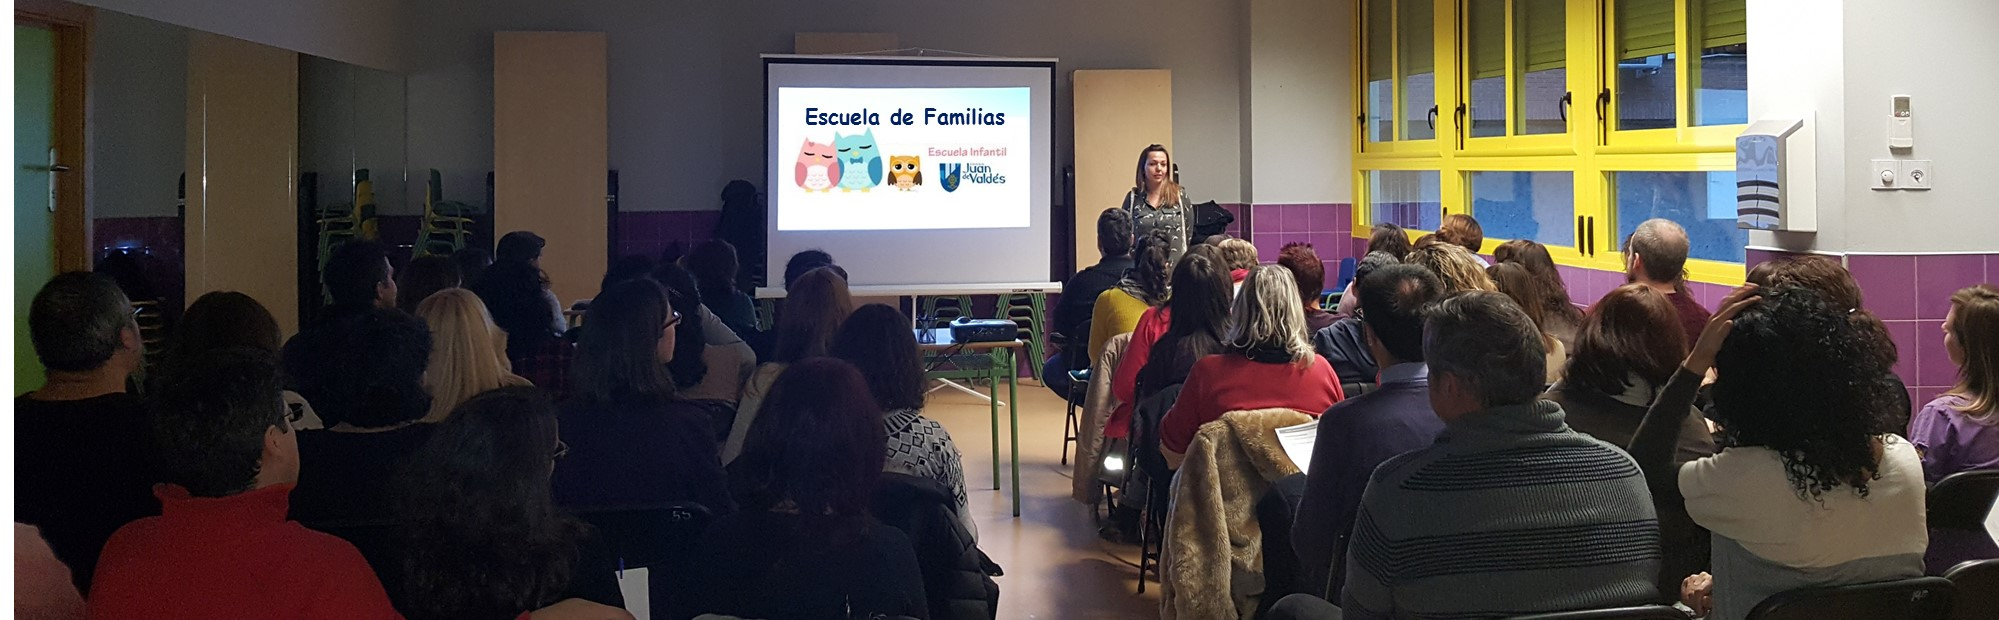 Foto Escuela Familias